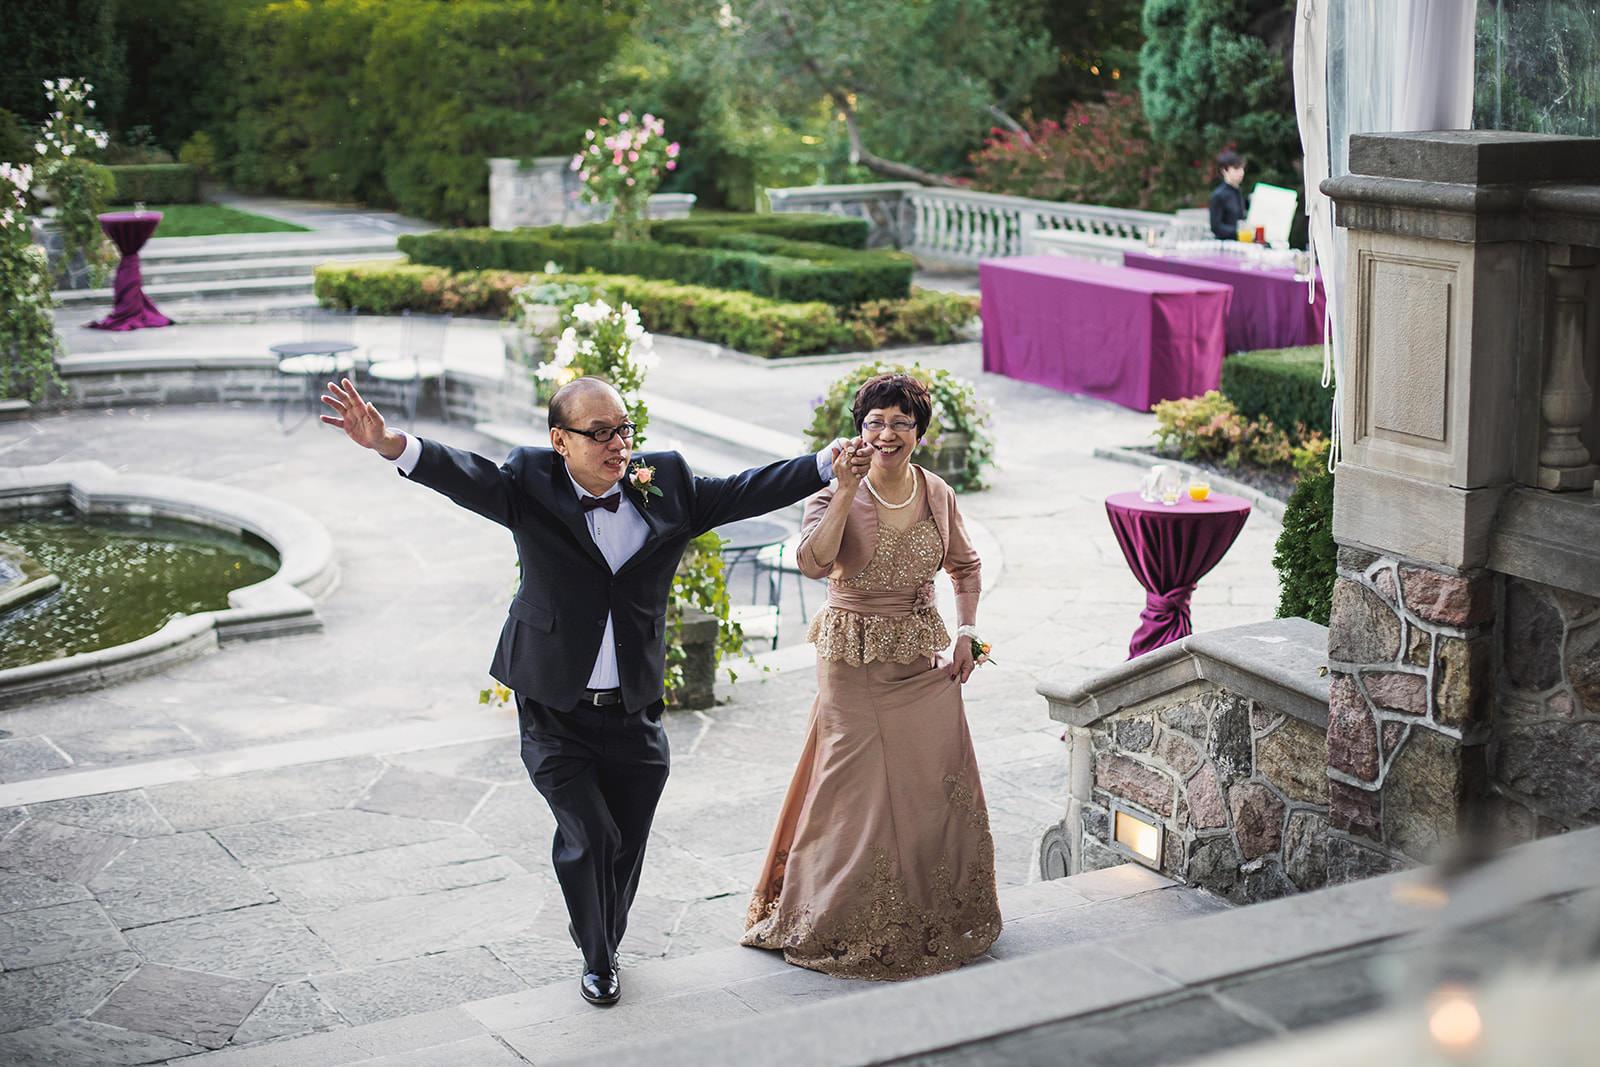 Graydon Hall Lovely Little wedding